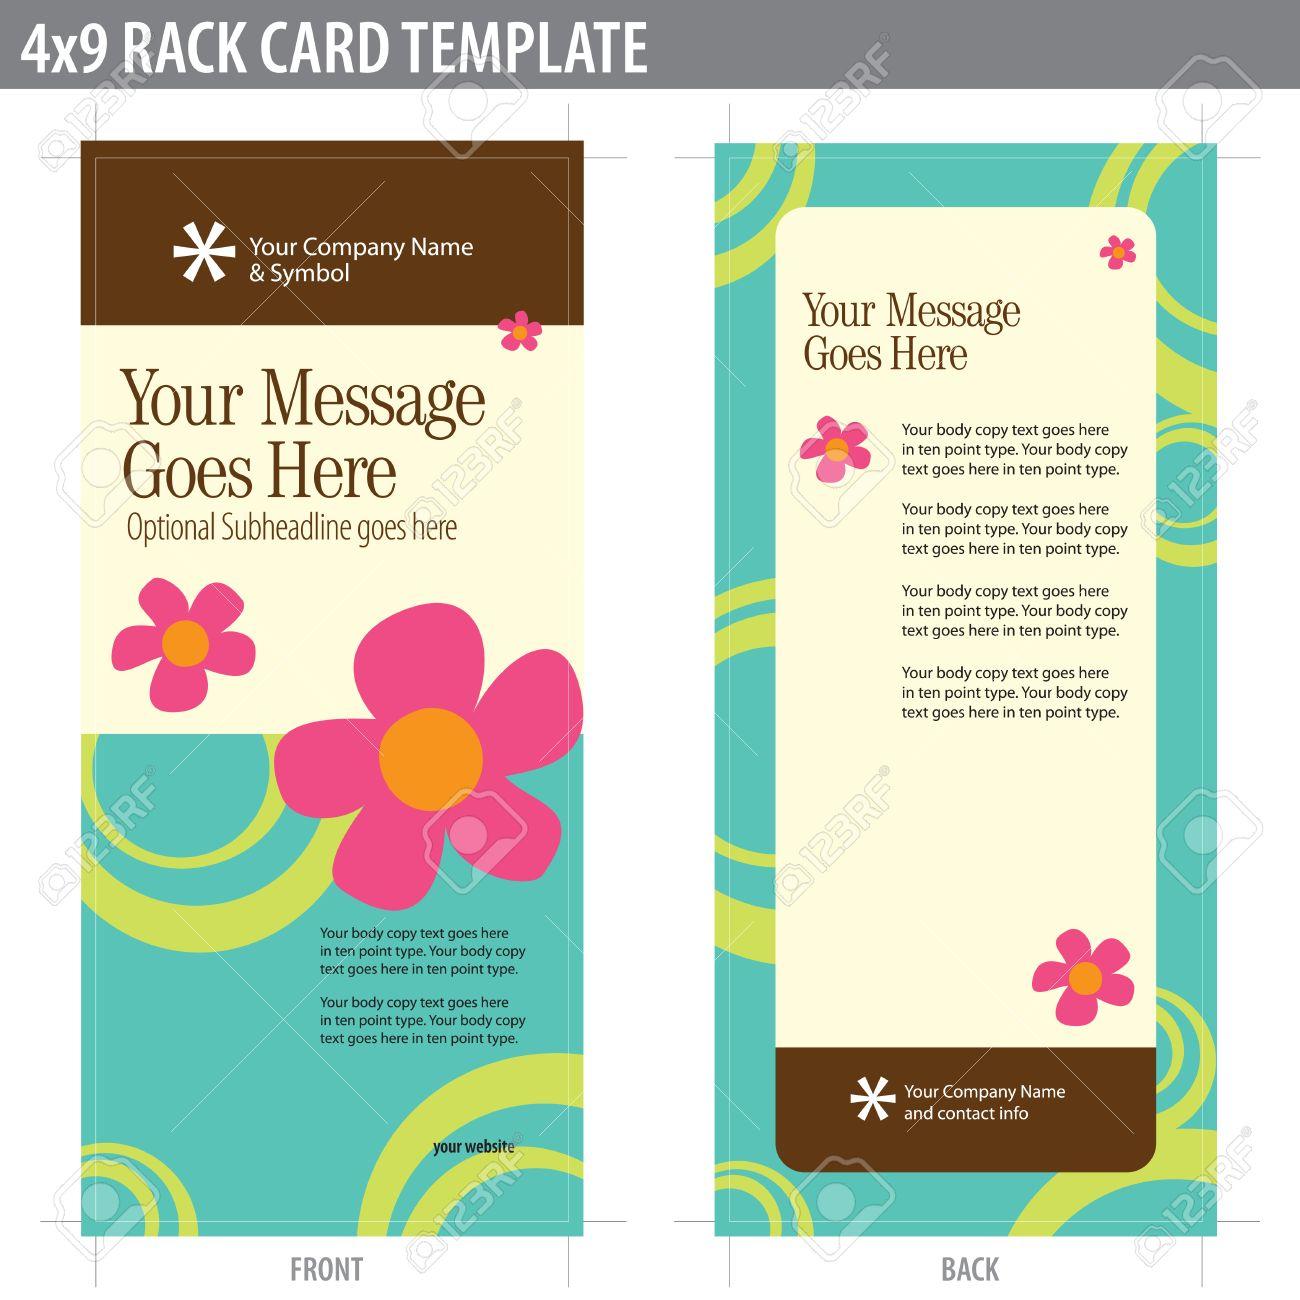 X Rack Card Brochure Template Includes Cropmarks Bleeds - 4x9 rack card template